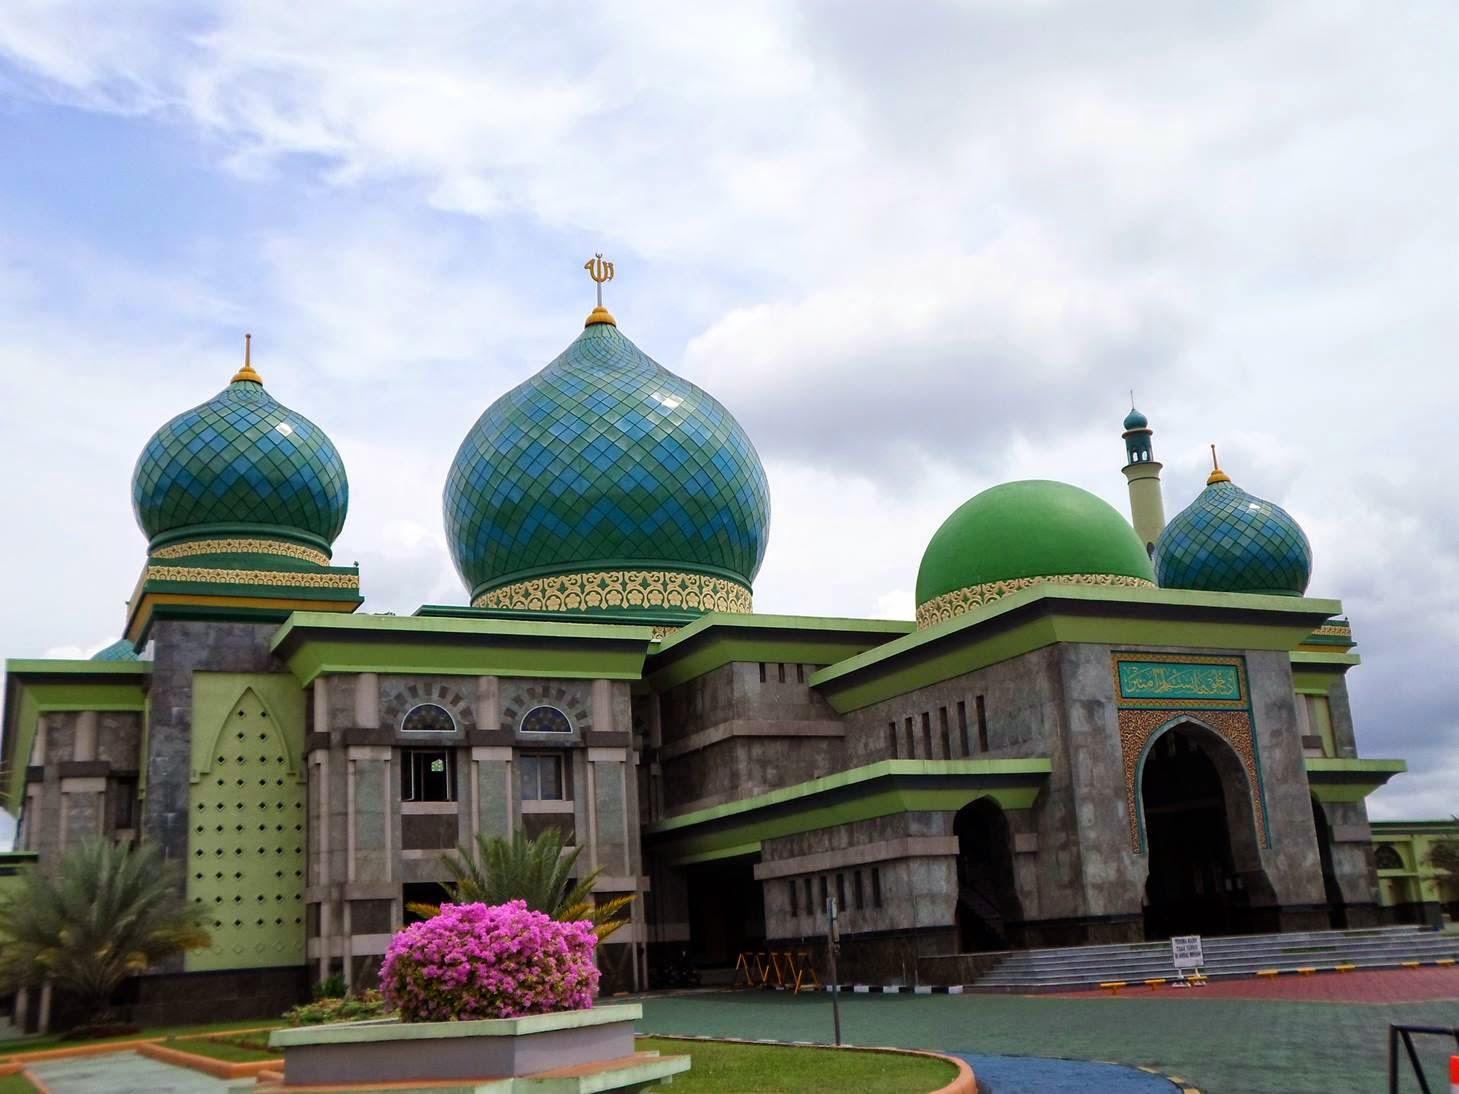 Masjid Raya Nur Pekanbaru Bina 70 Mualaf Ekonomi Pos Ekonomipos